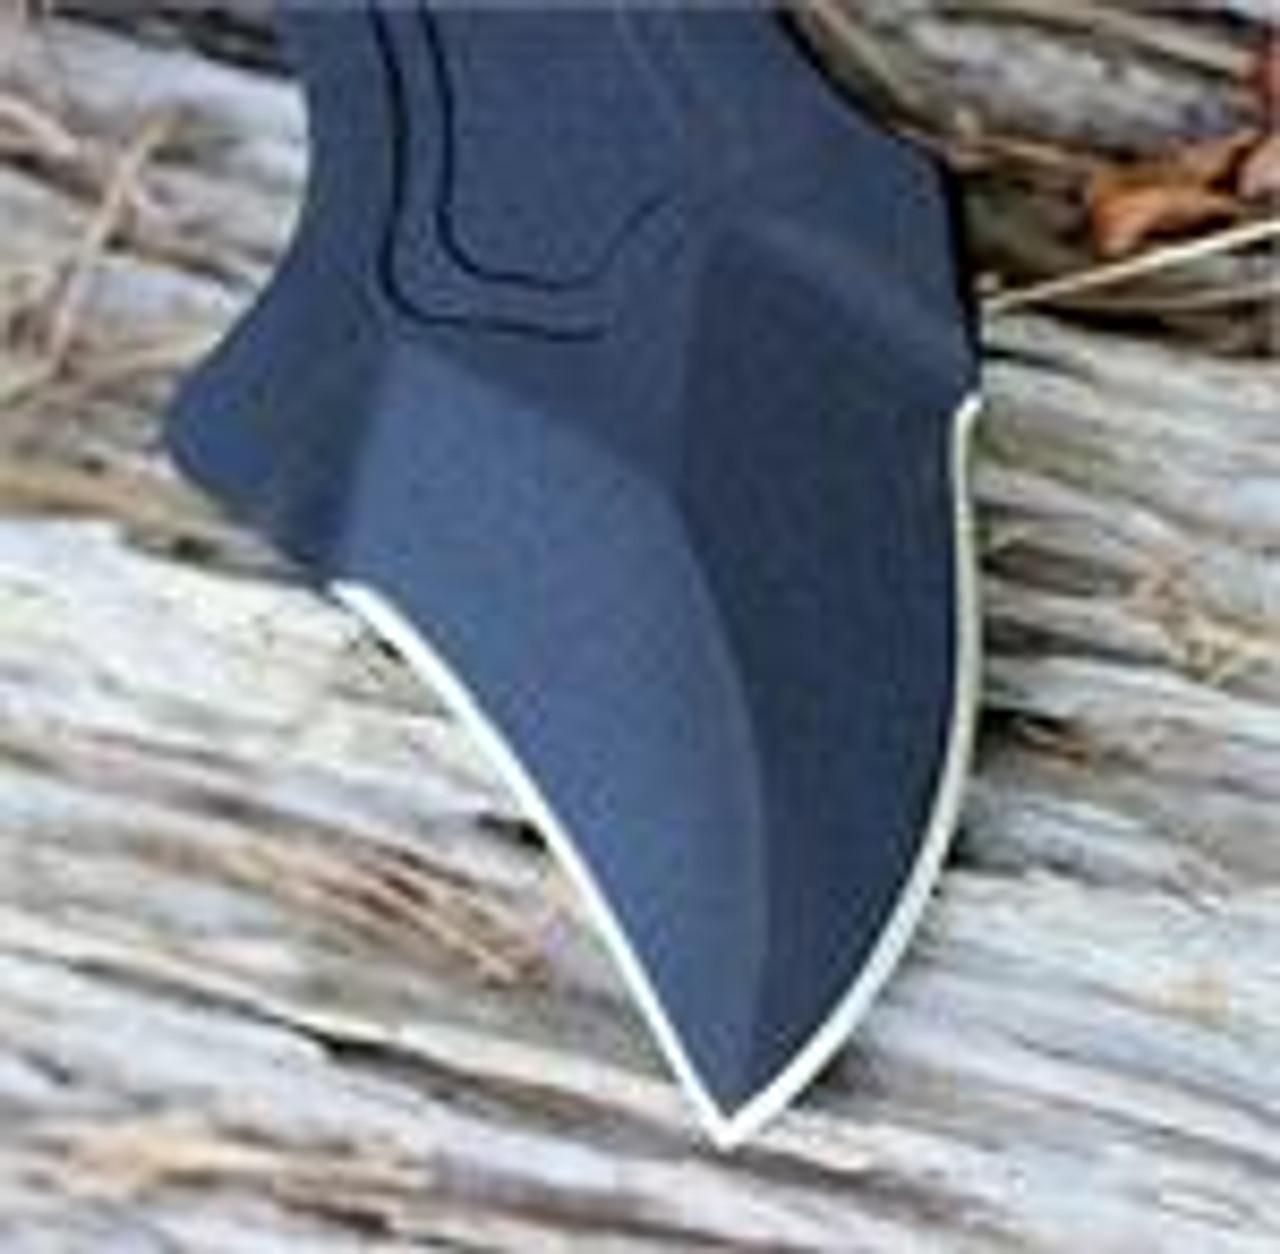 TOPS Knives VI AX, Polished Blade, Black Handles O-Rings, Black Leather Sheath